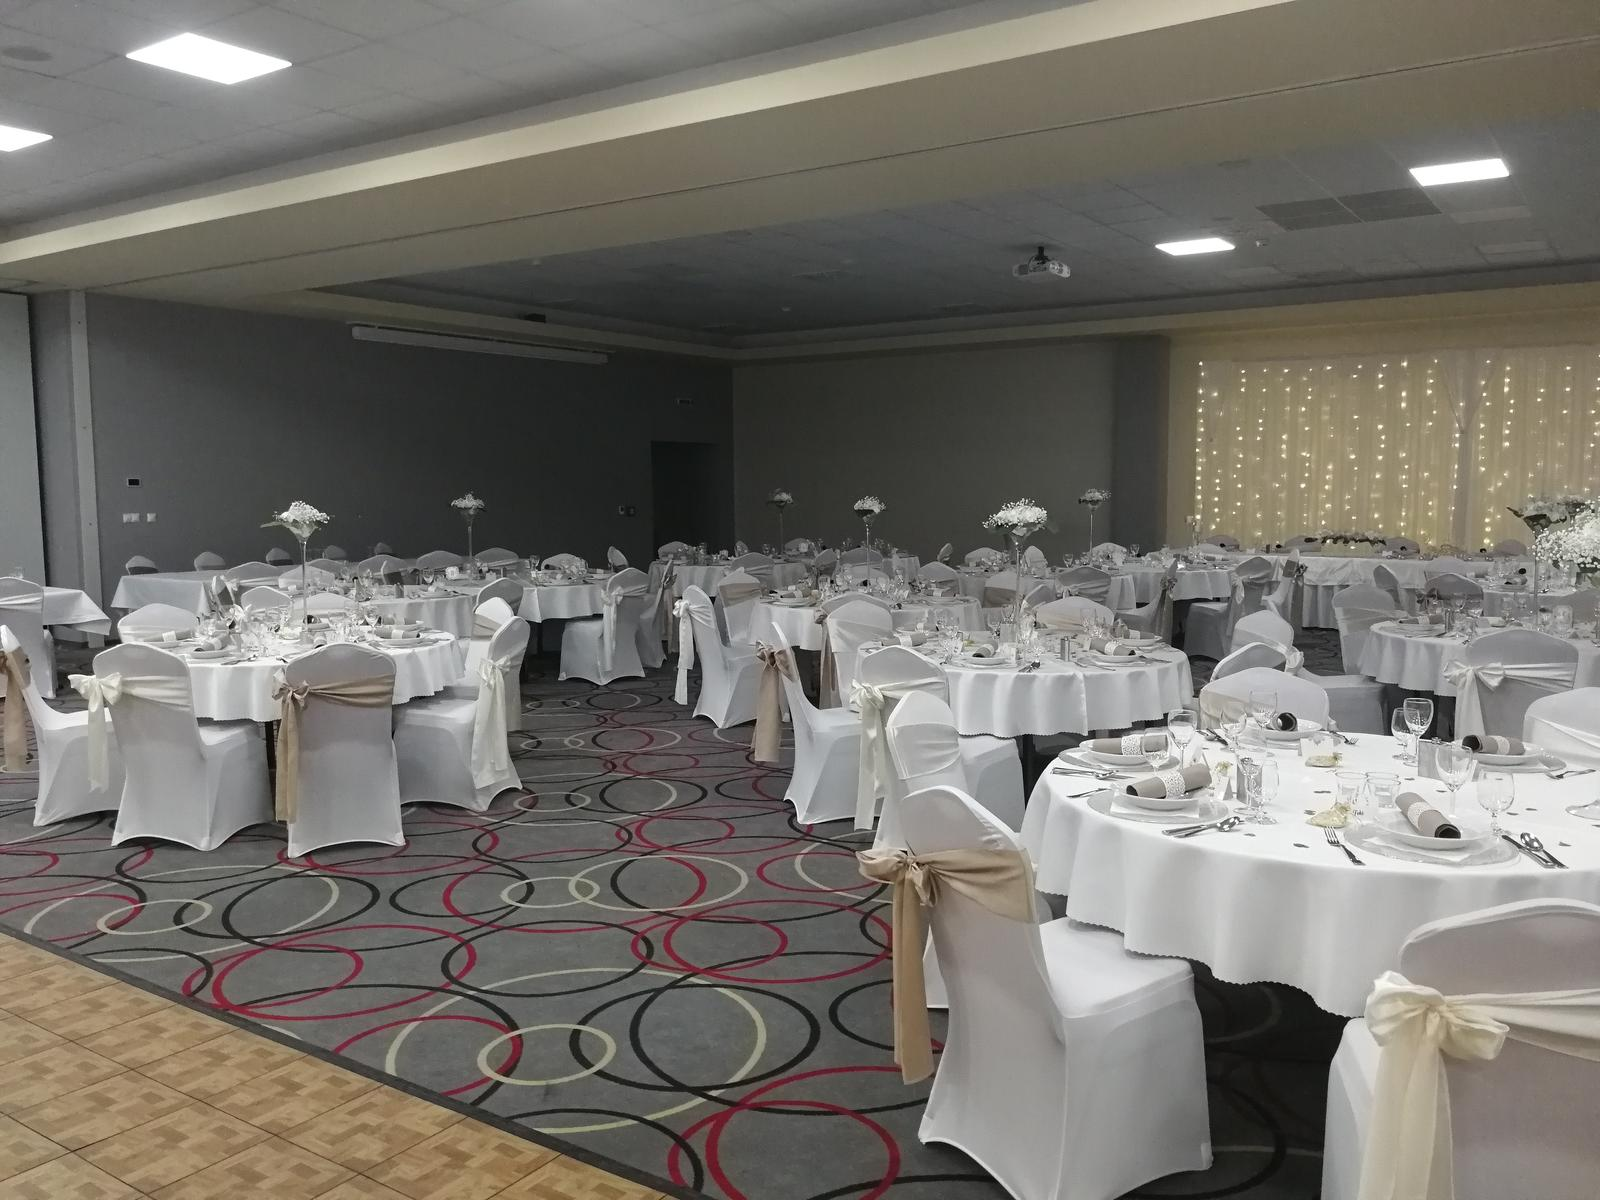 Svadba 7.4.2018 Zvolen Hotel TENIS - Obrázok č. 11